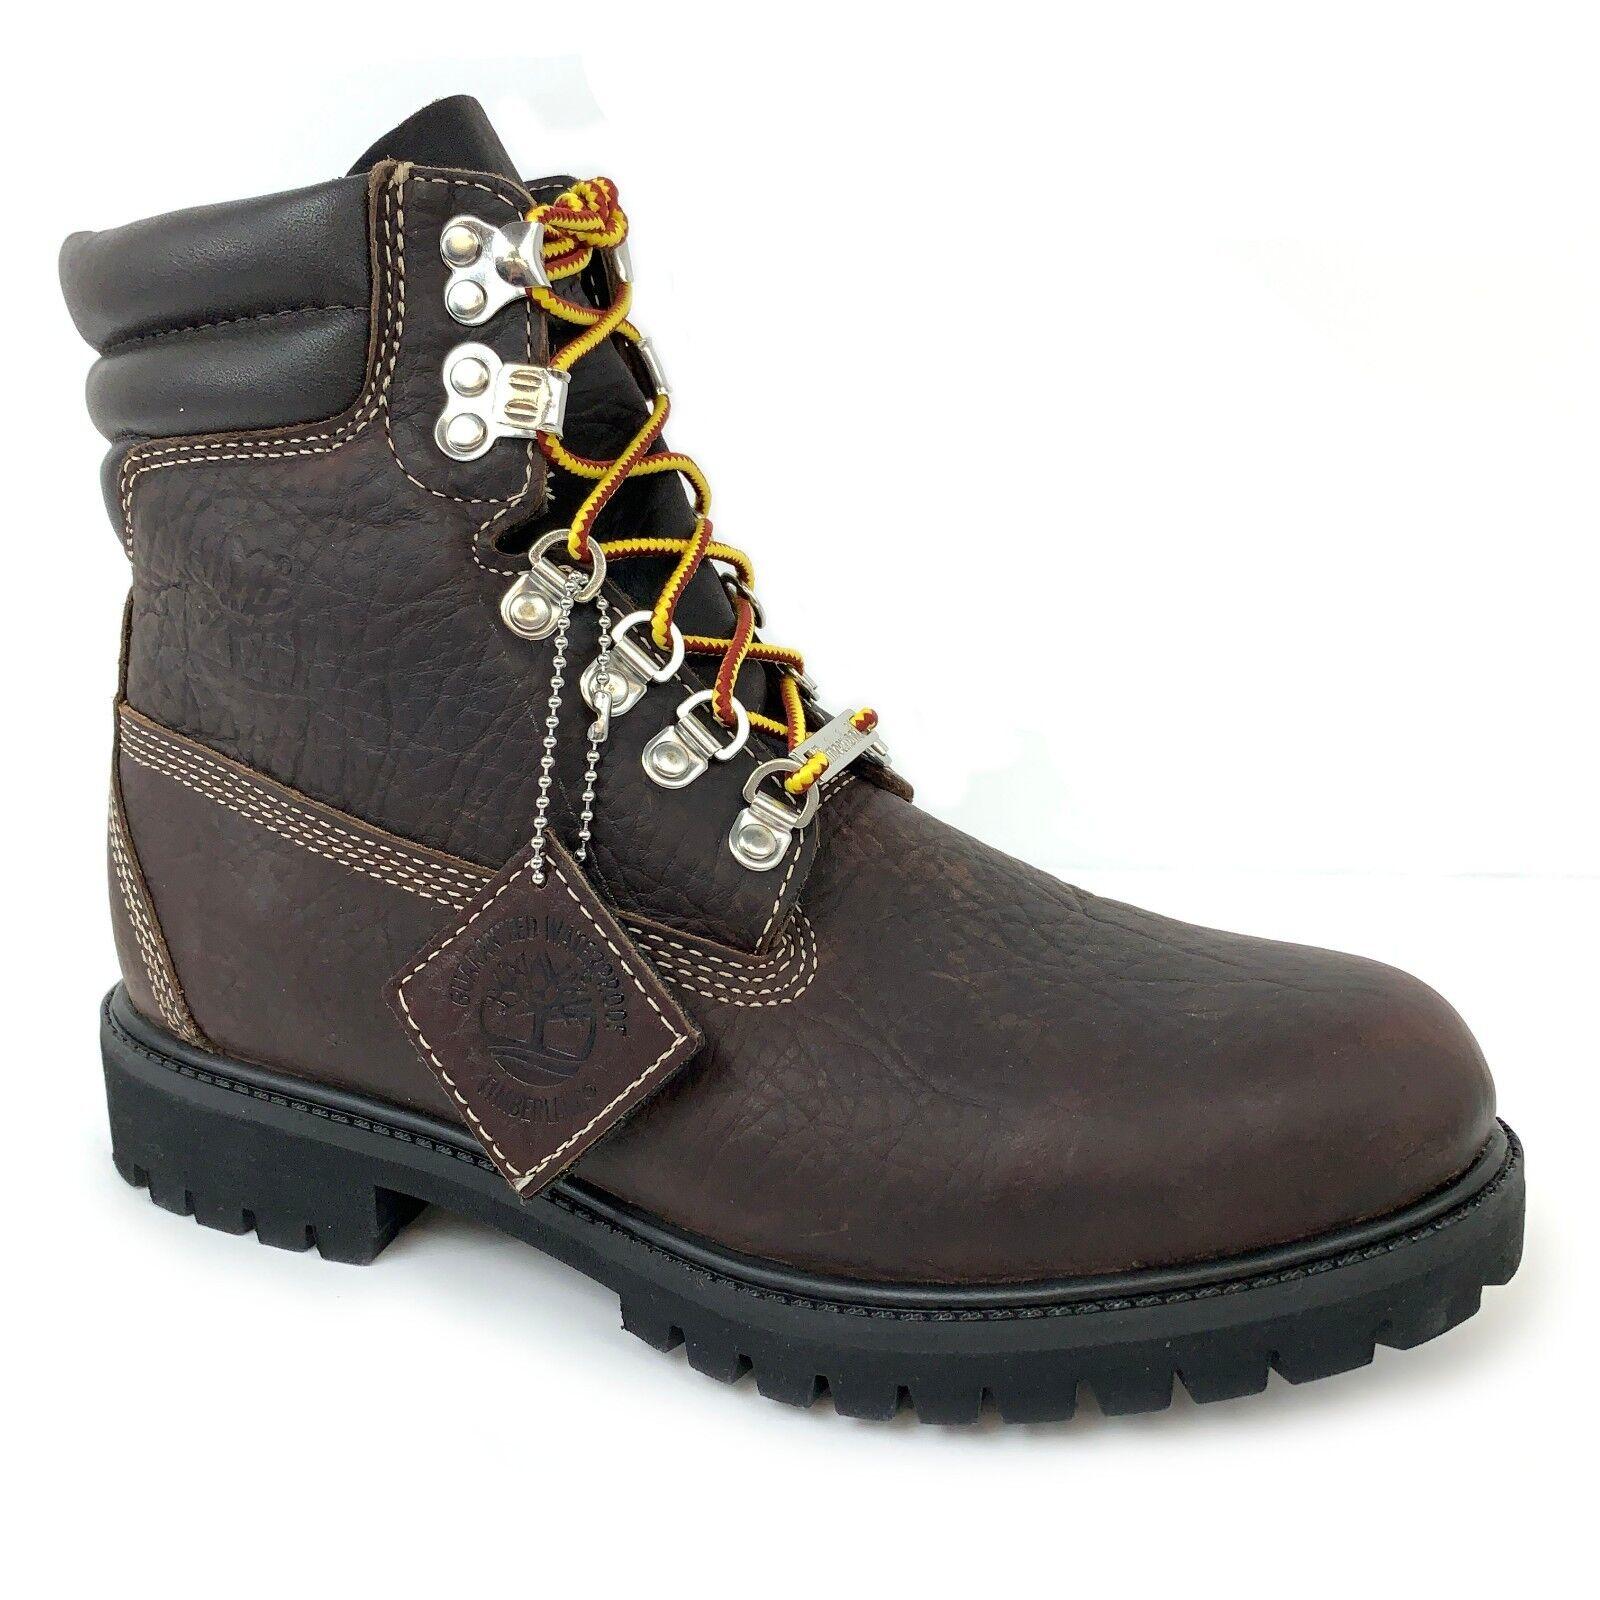 "Timberland Men's 6"" Premium 640 Below Waterproof Dark Brown Leather Boots A1UKI"